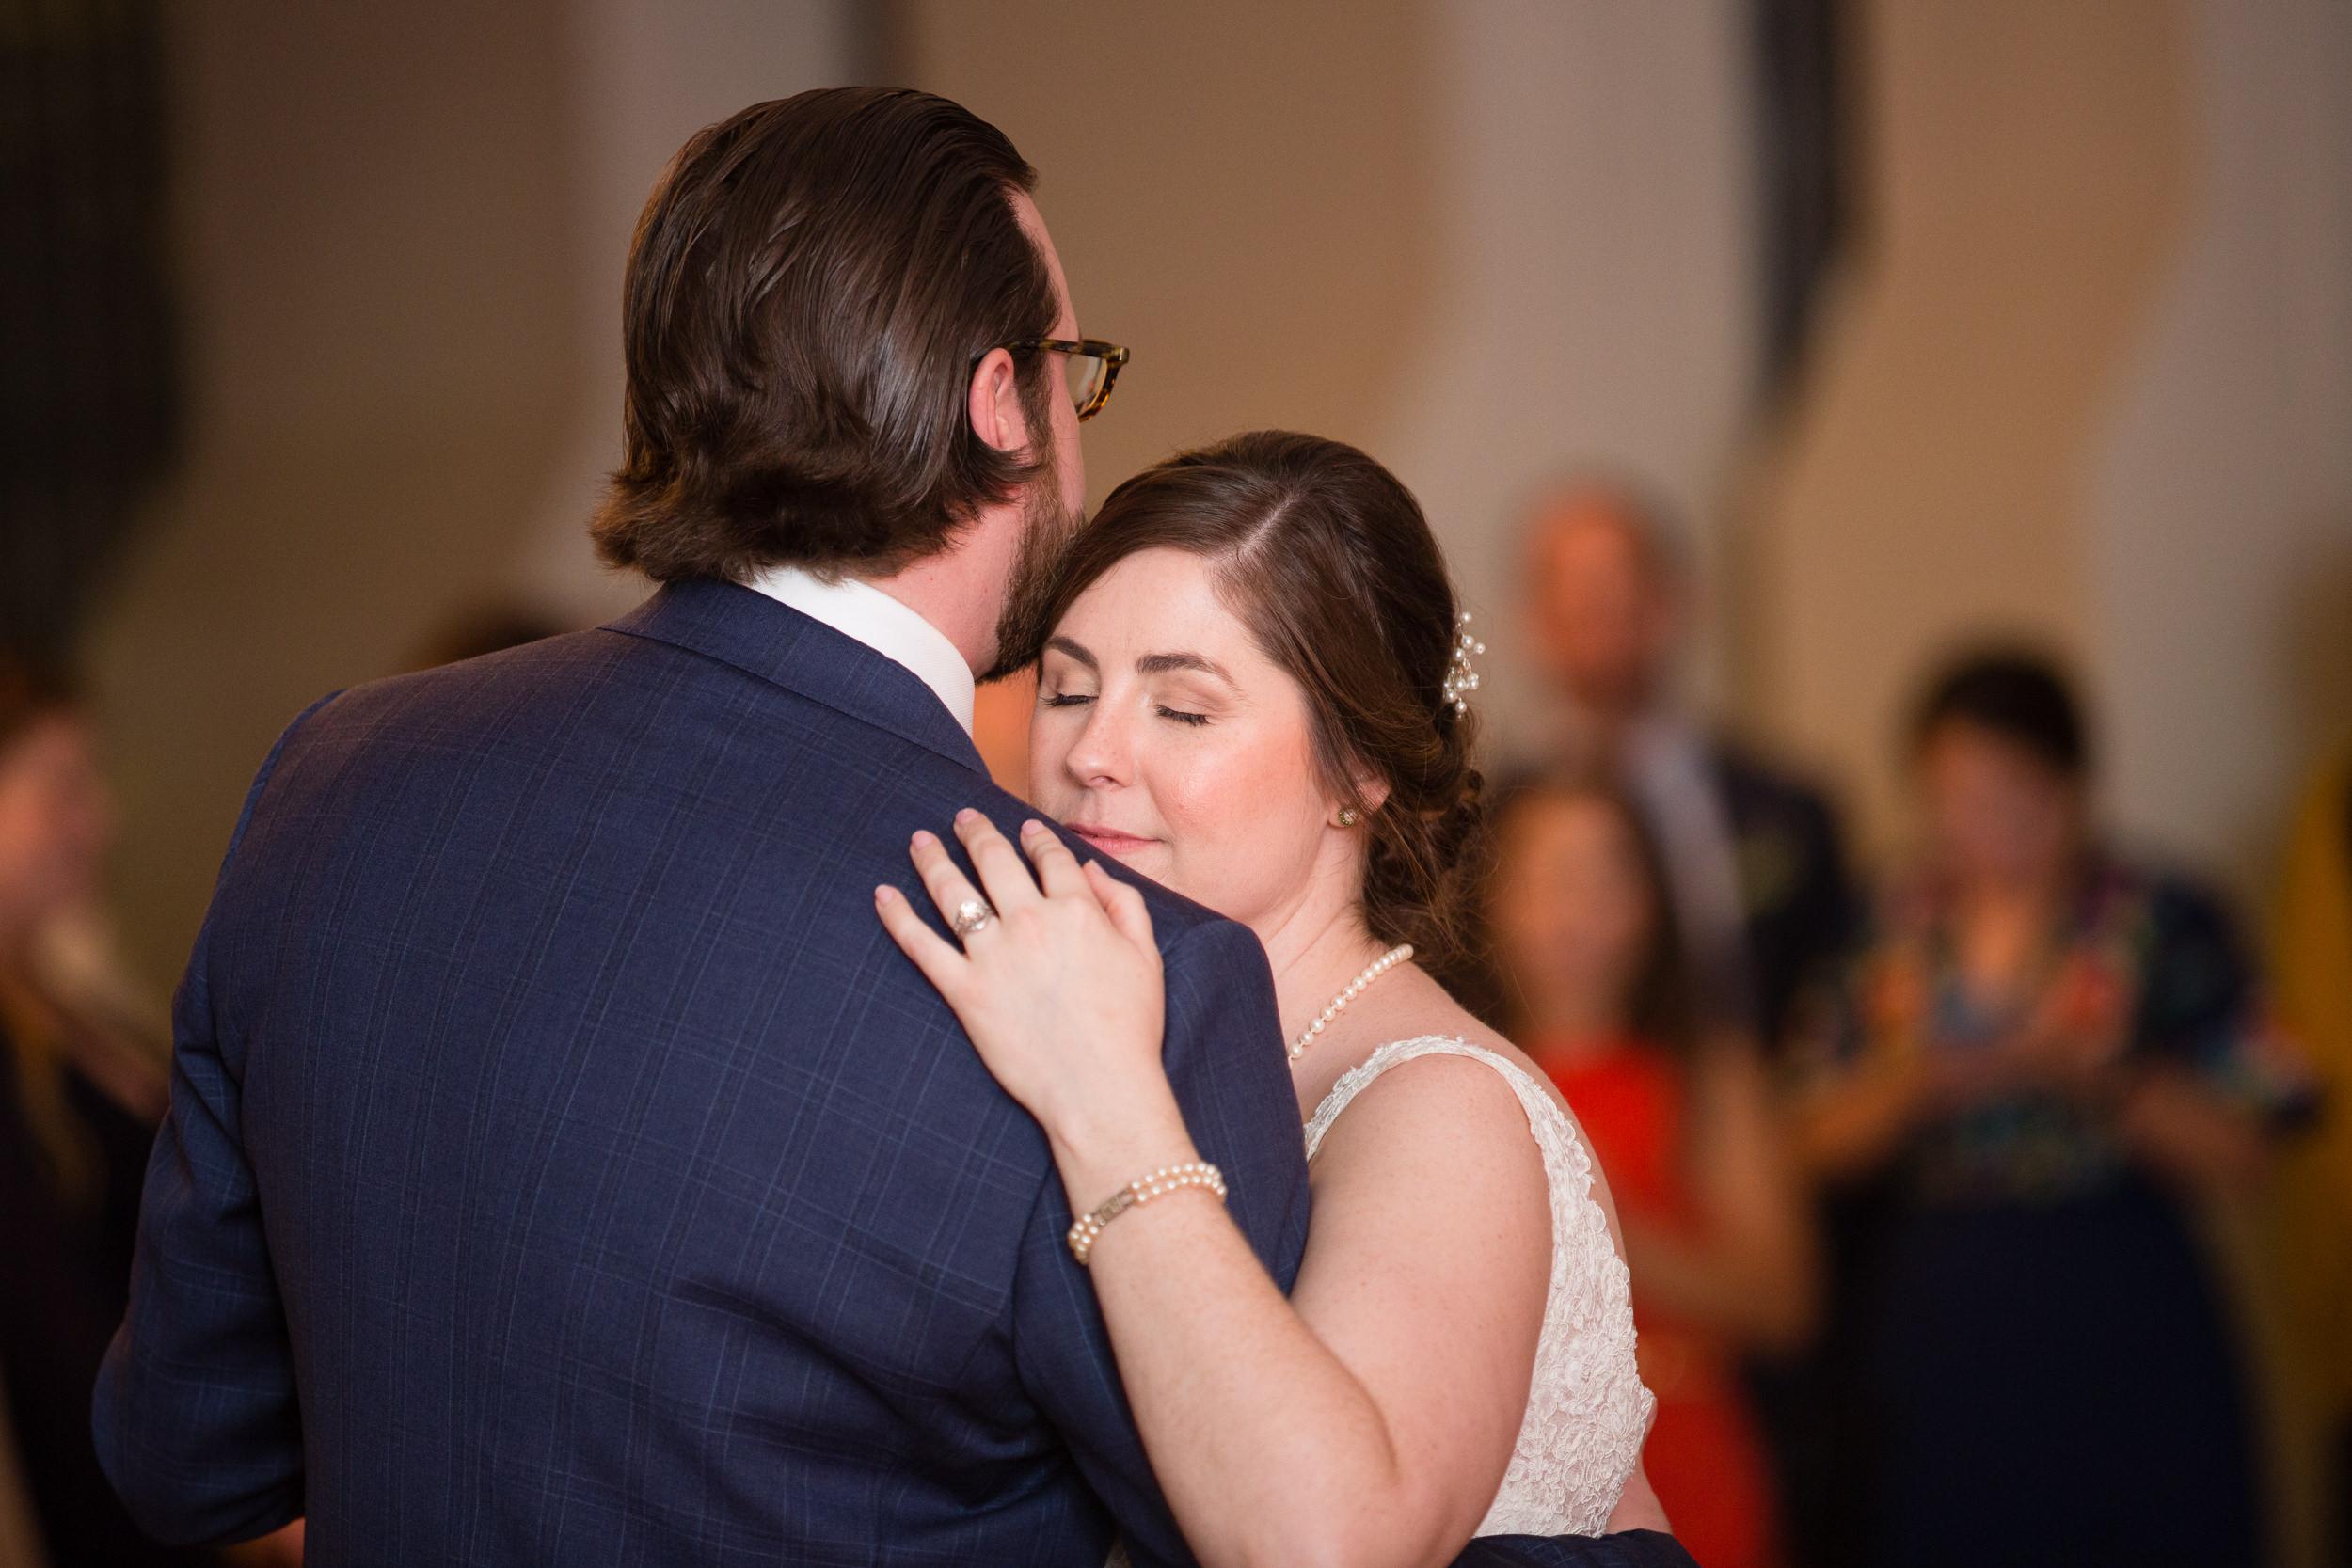 LK_Birmingham_AL_Wedding_2019-00054.jpg